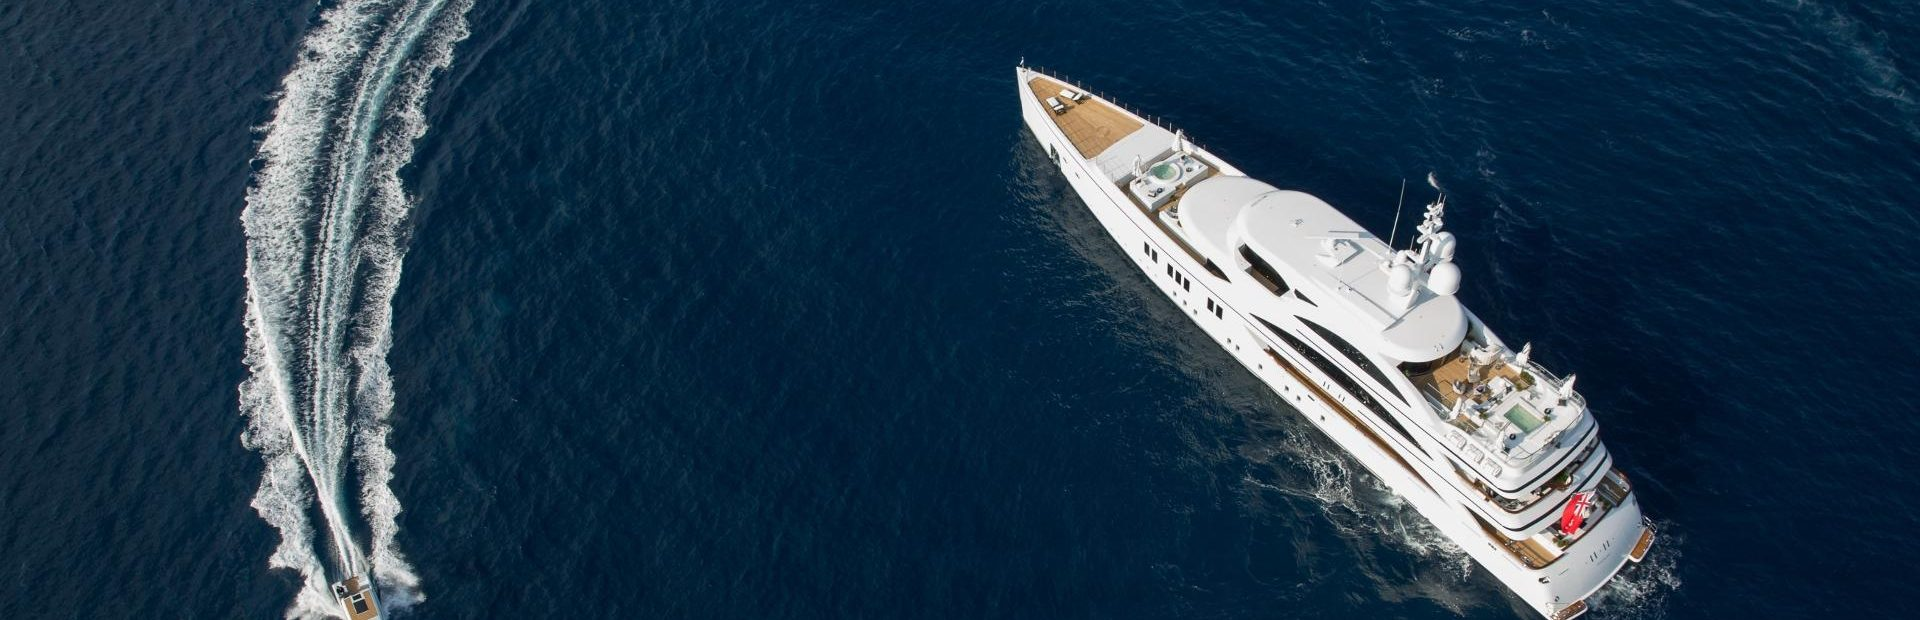 Benetti Yachts  Profile Photo